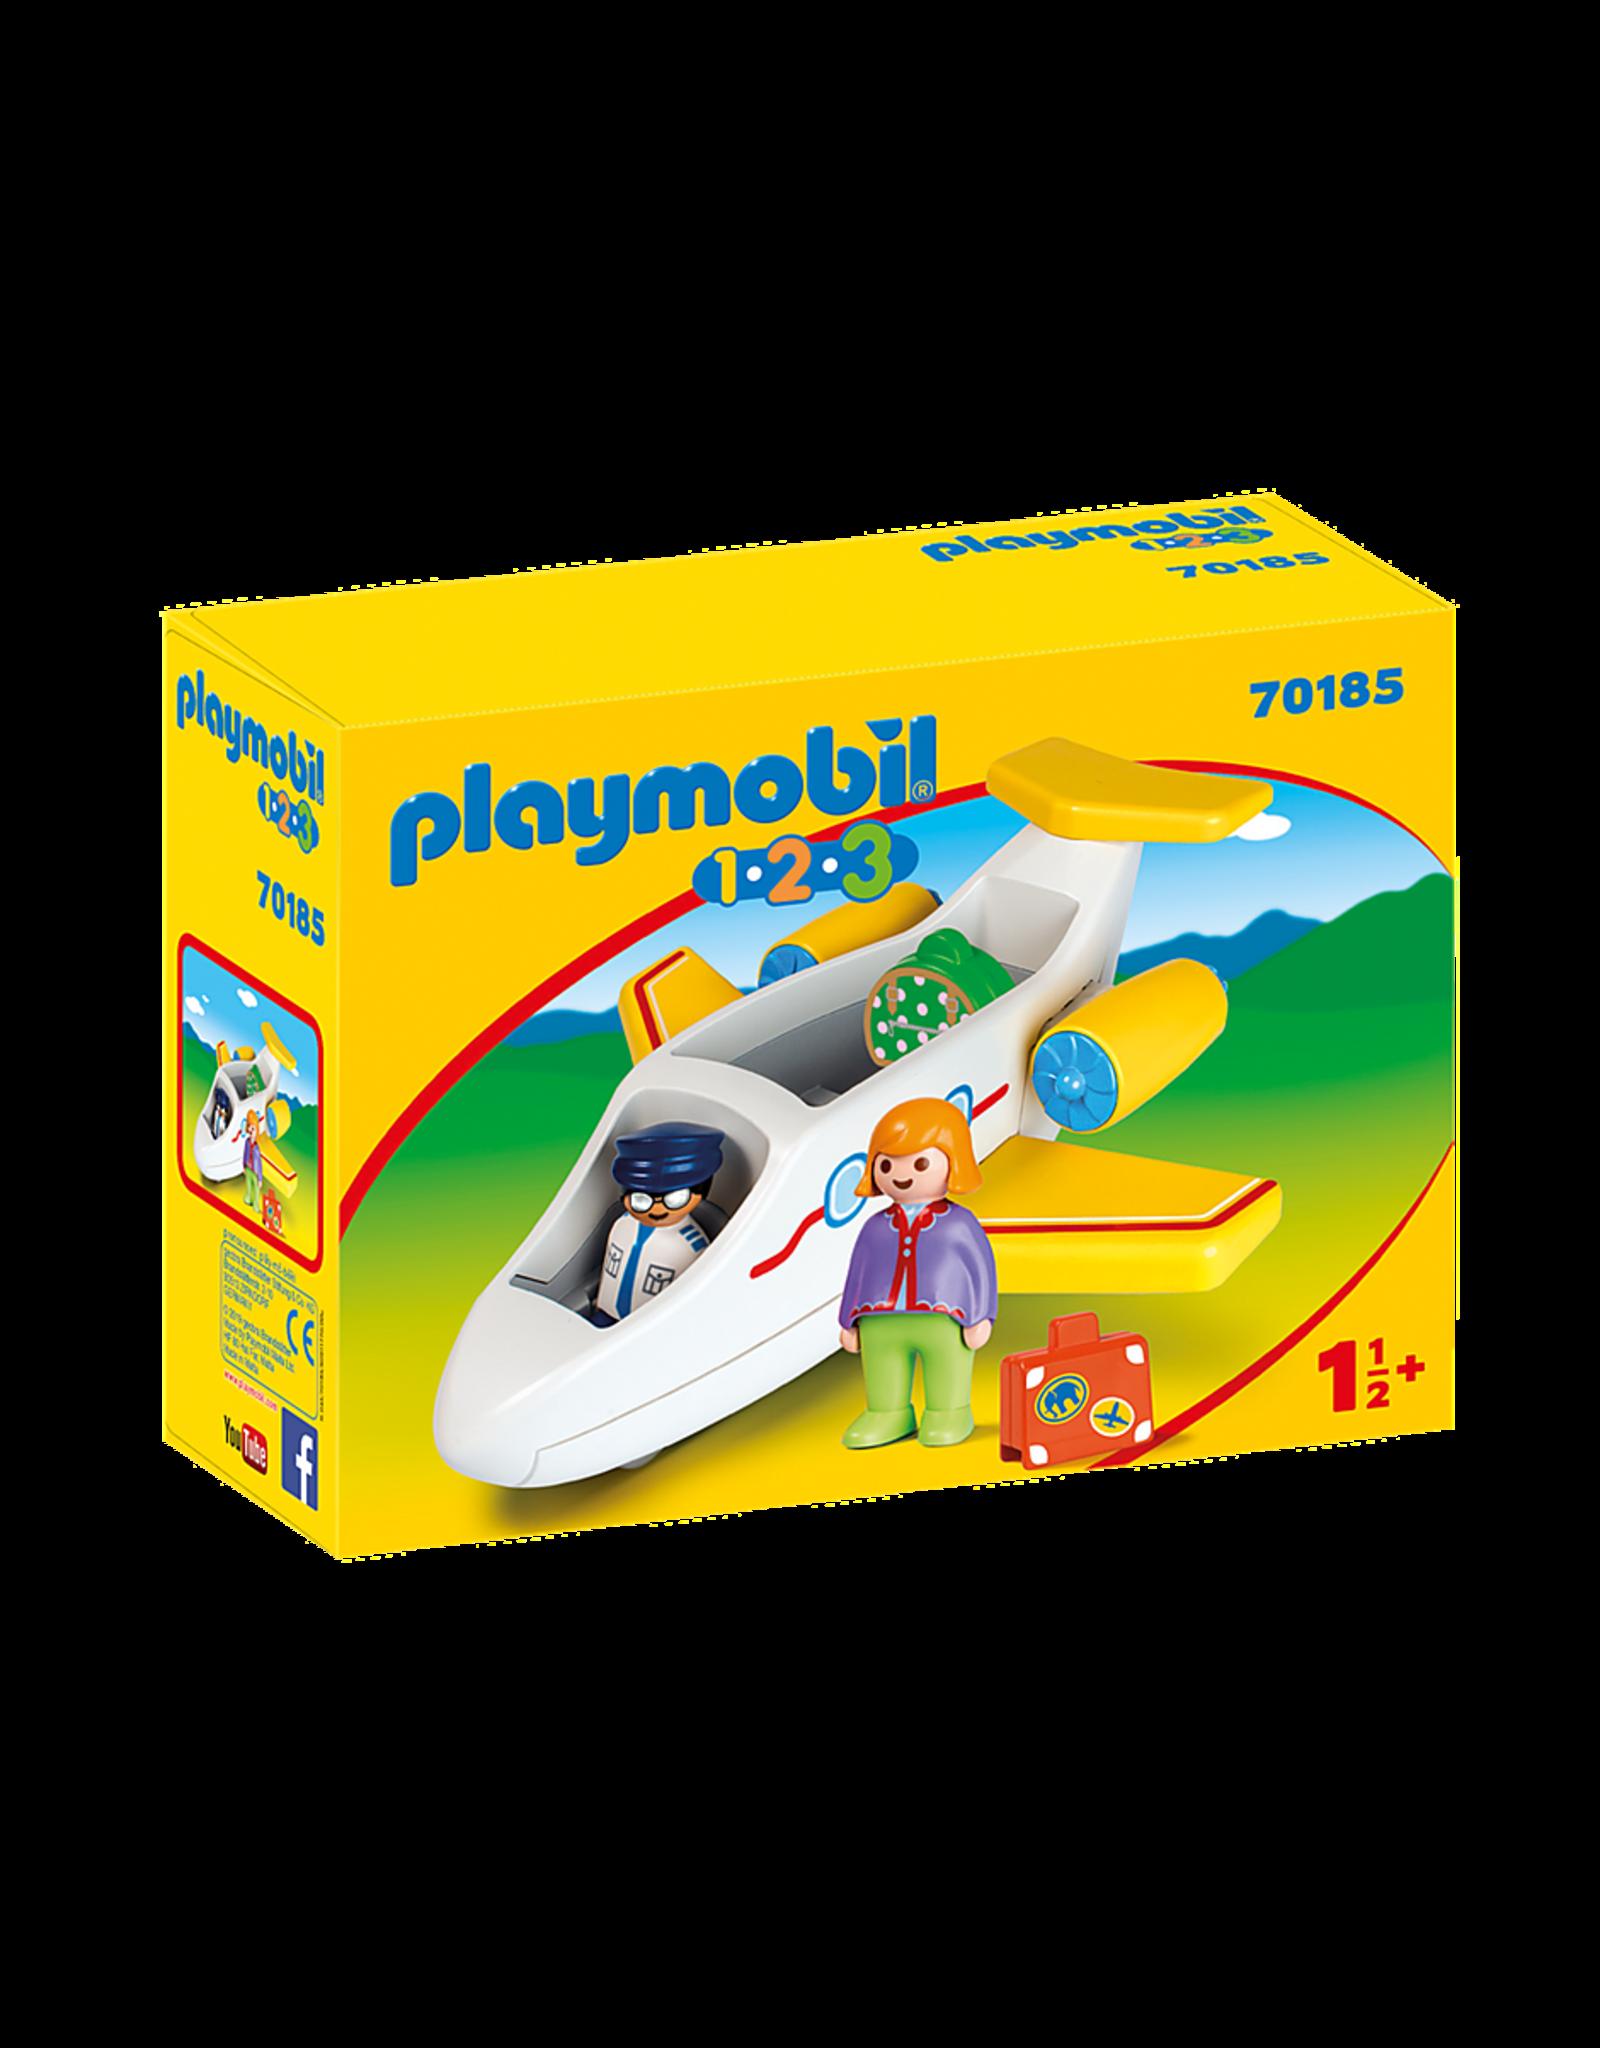 Playmobil Plane with Passenger